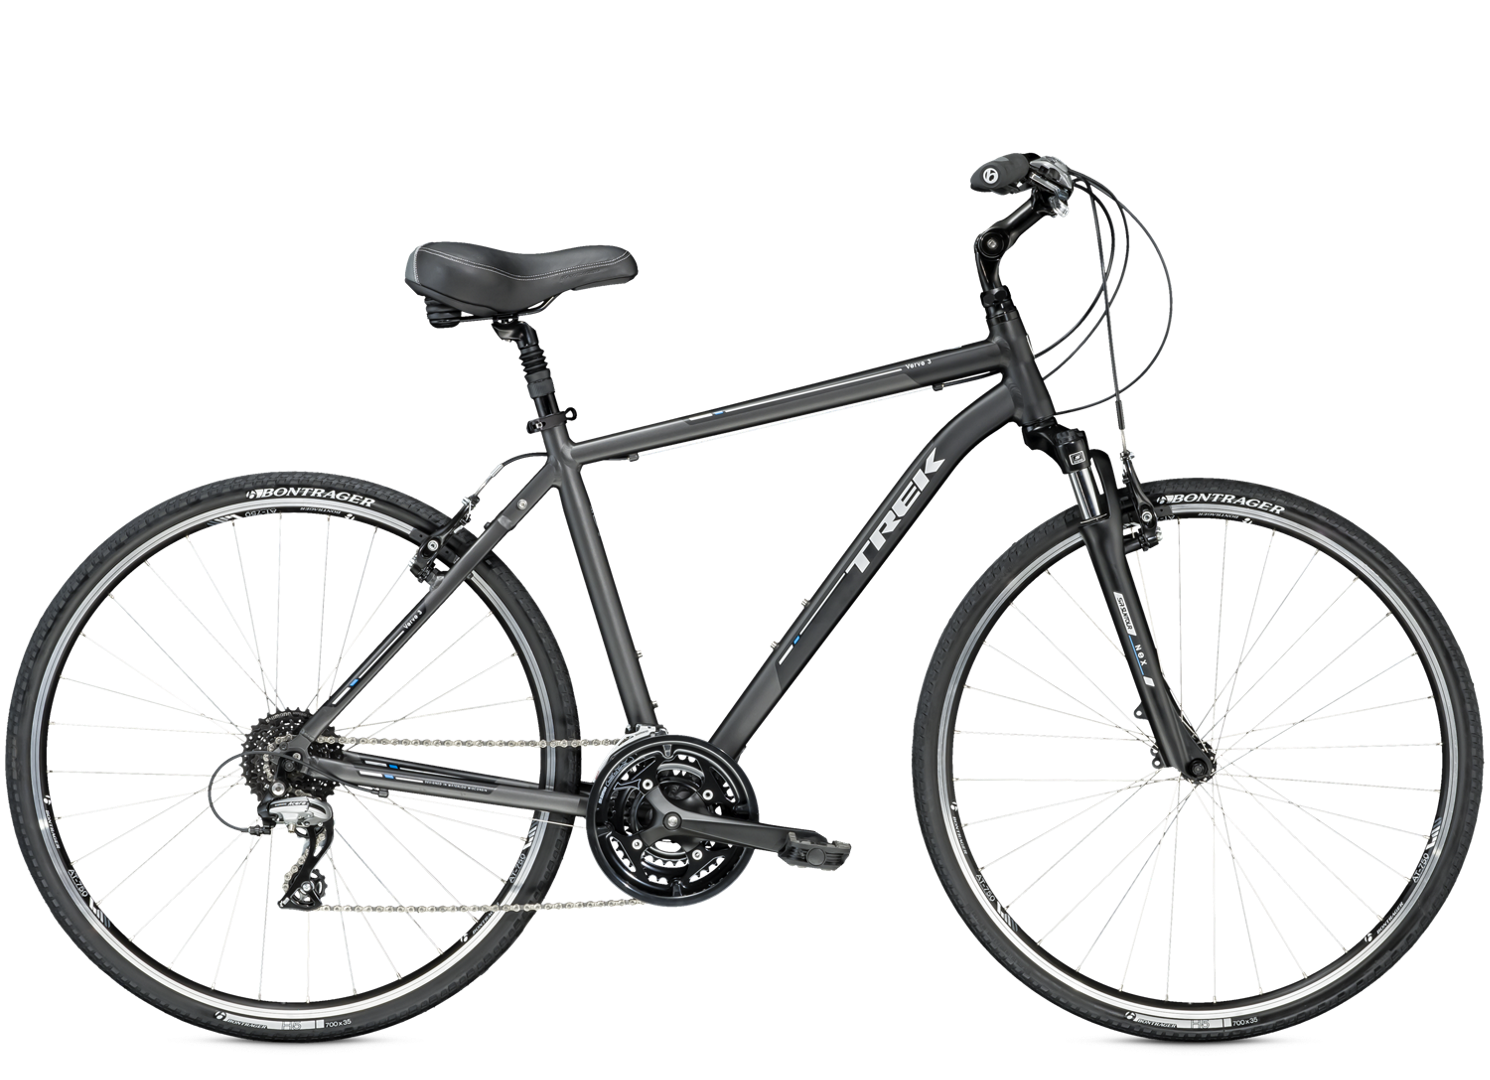 Verve 3 Trek Bicycle